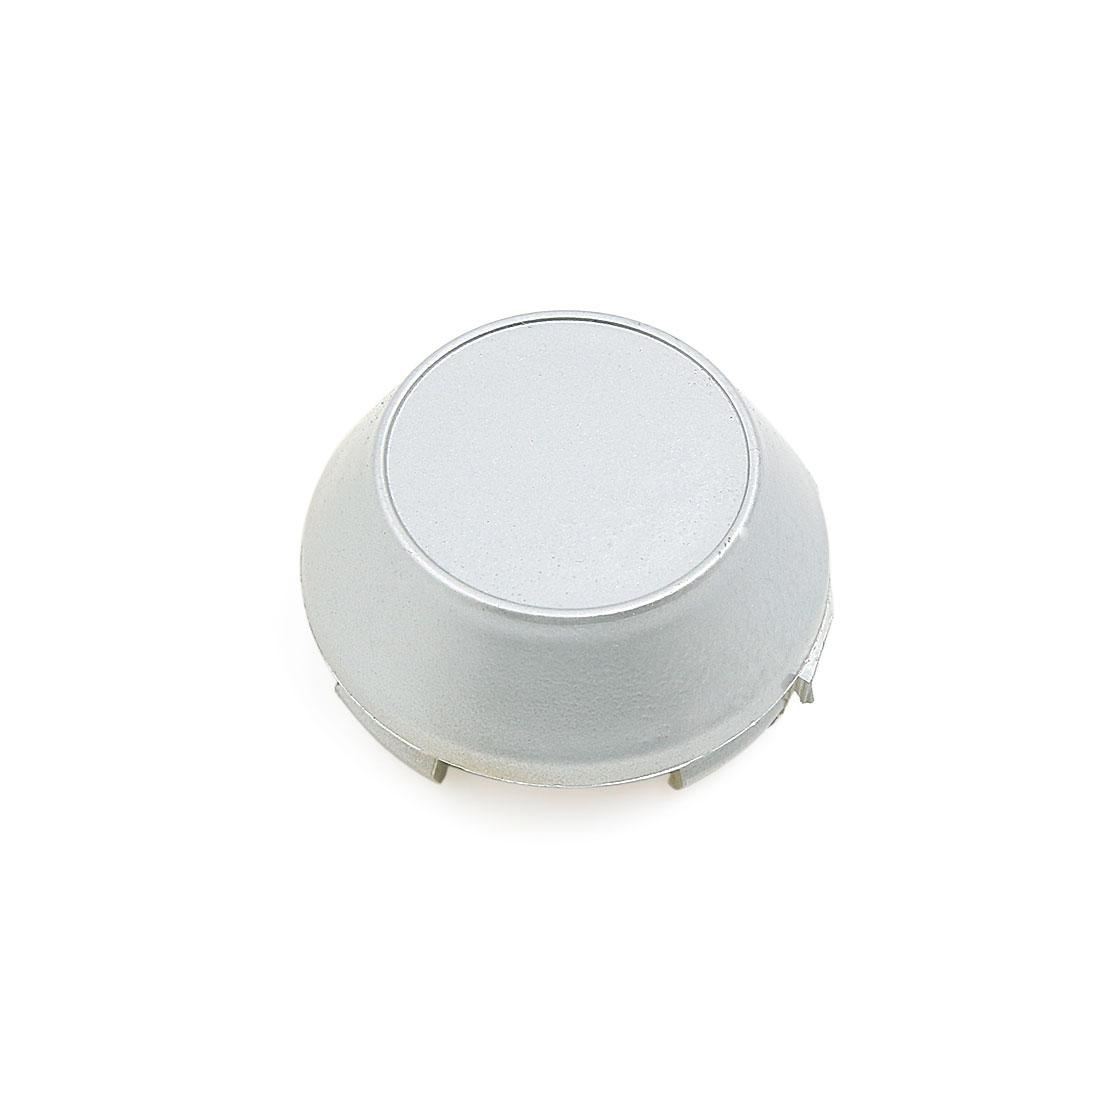 Universal Racing Car Automotive Wheel Center Hub Caps Covers 60mm Diameter